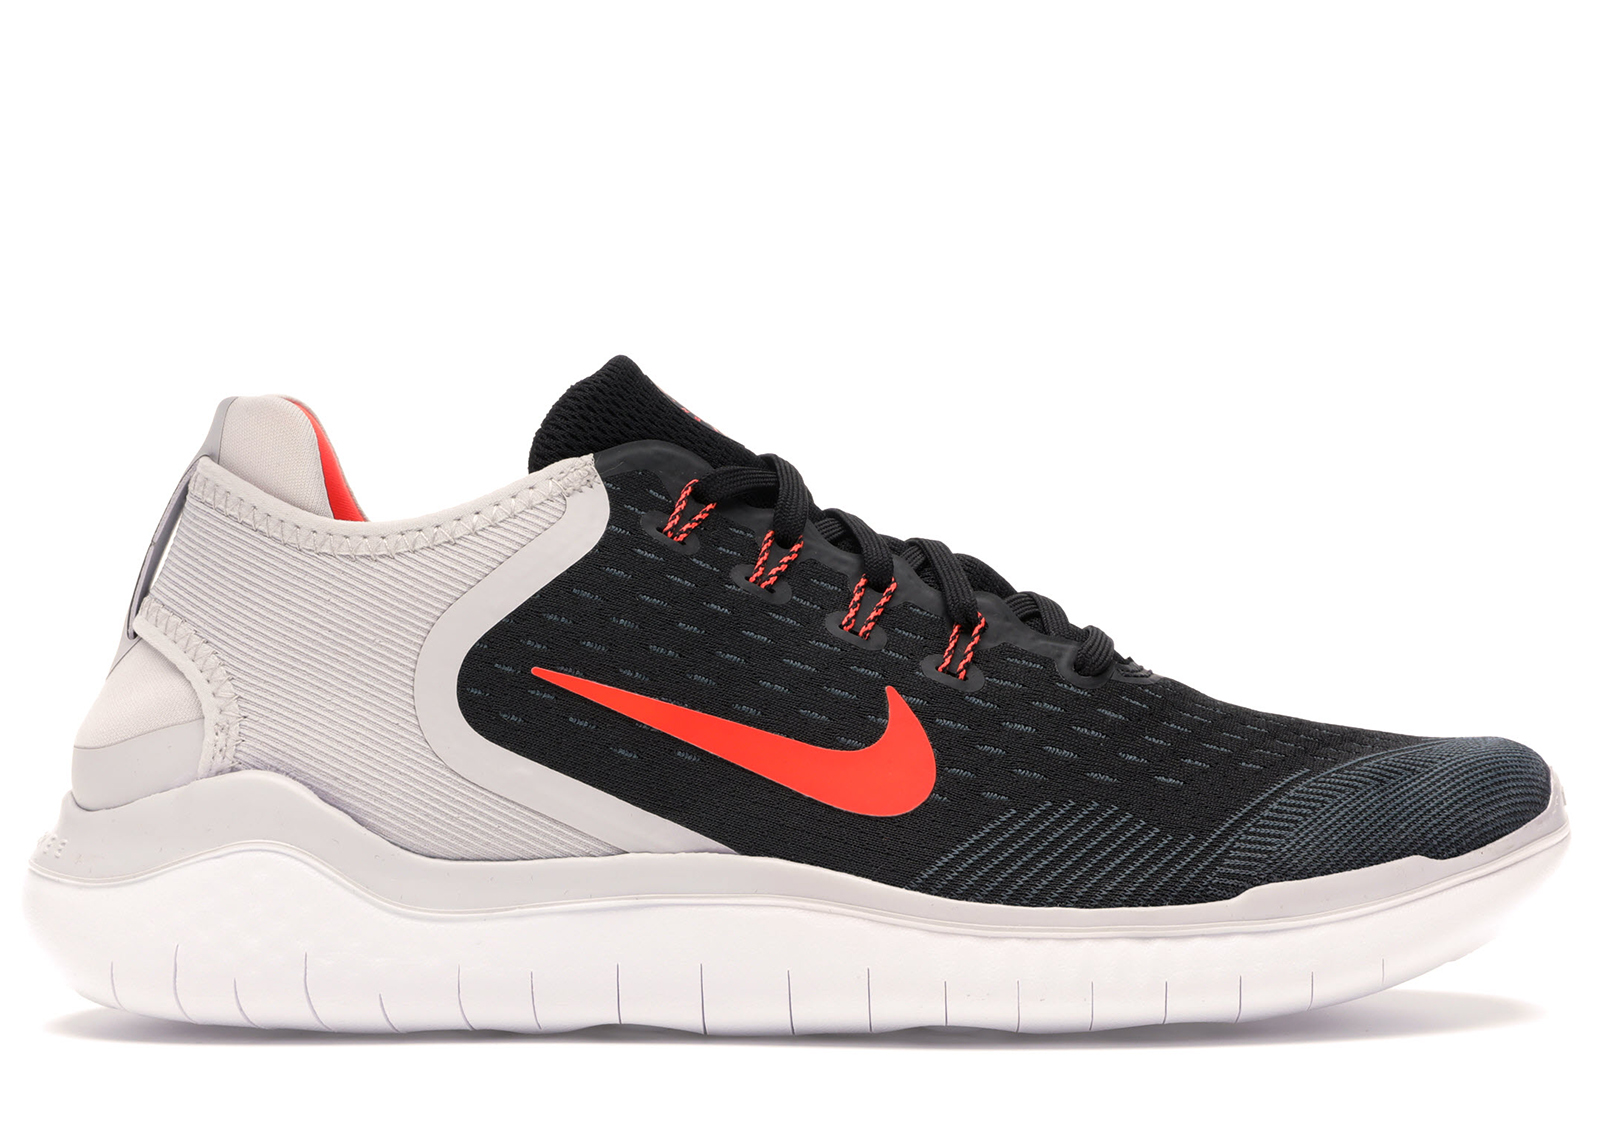 Nike Free RN 2018 Black Vast Grey